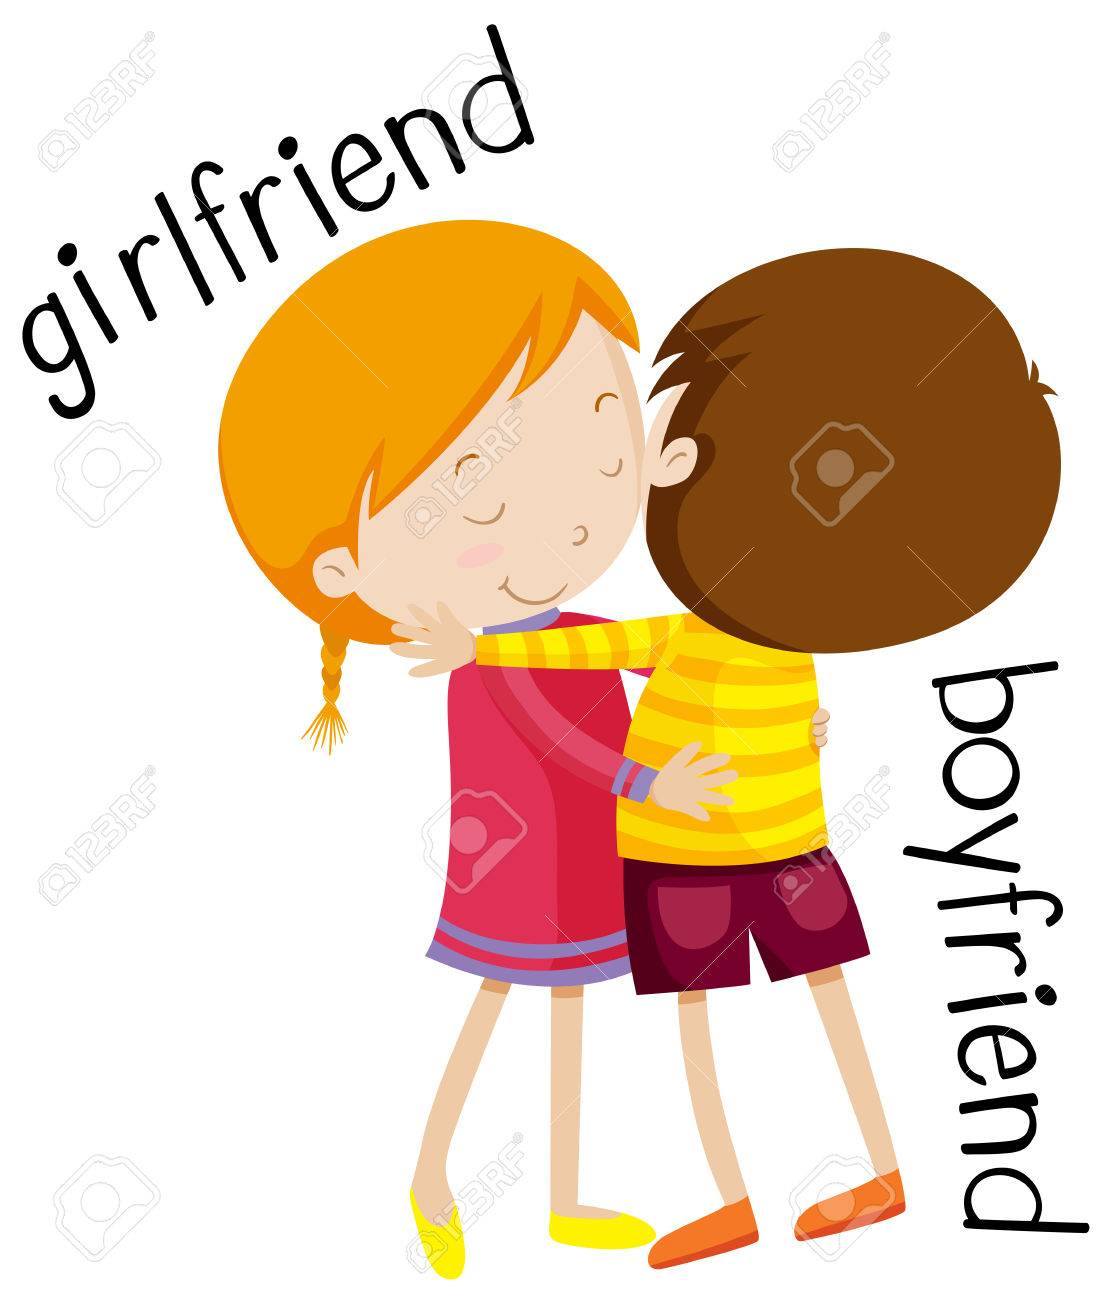 Girlfriend and boyfriend hugging illustration.